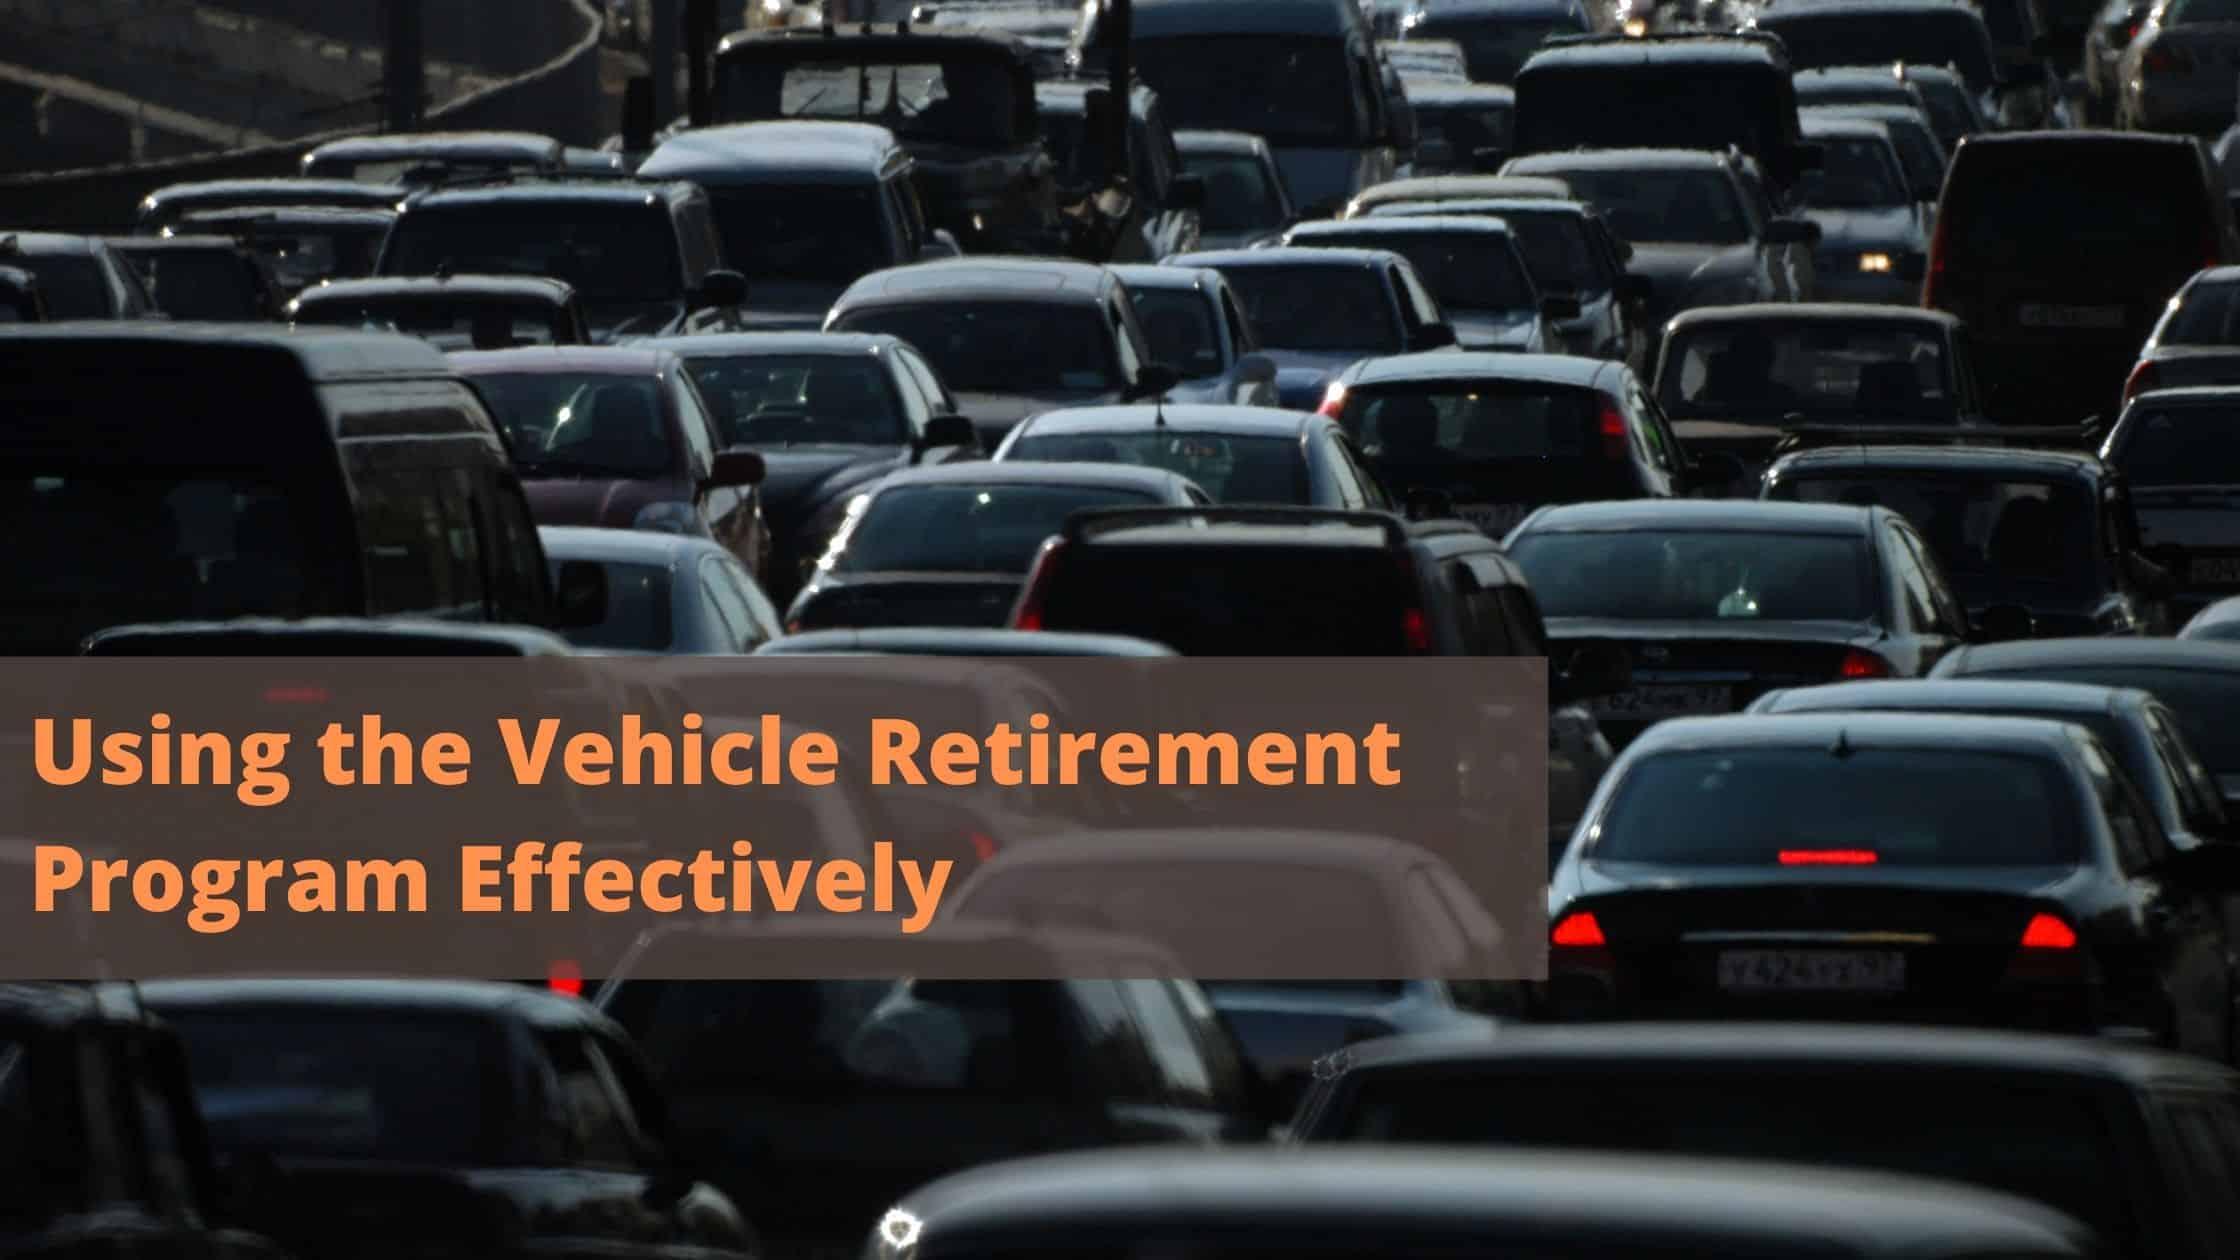 Using the Vehicle Retirement Program Effectively